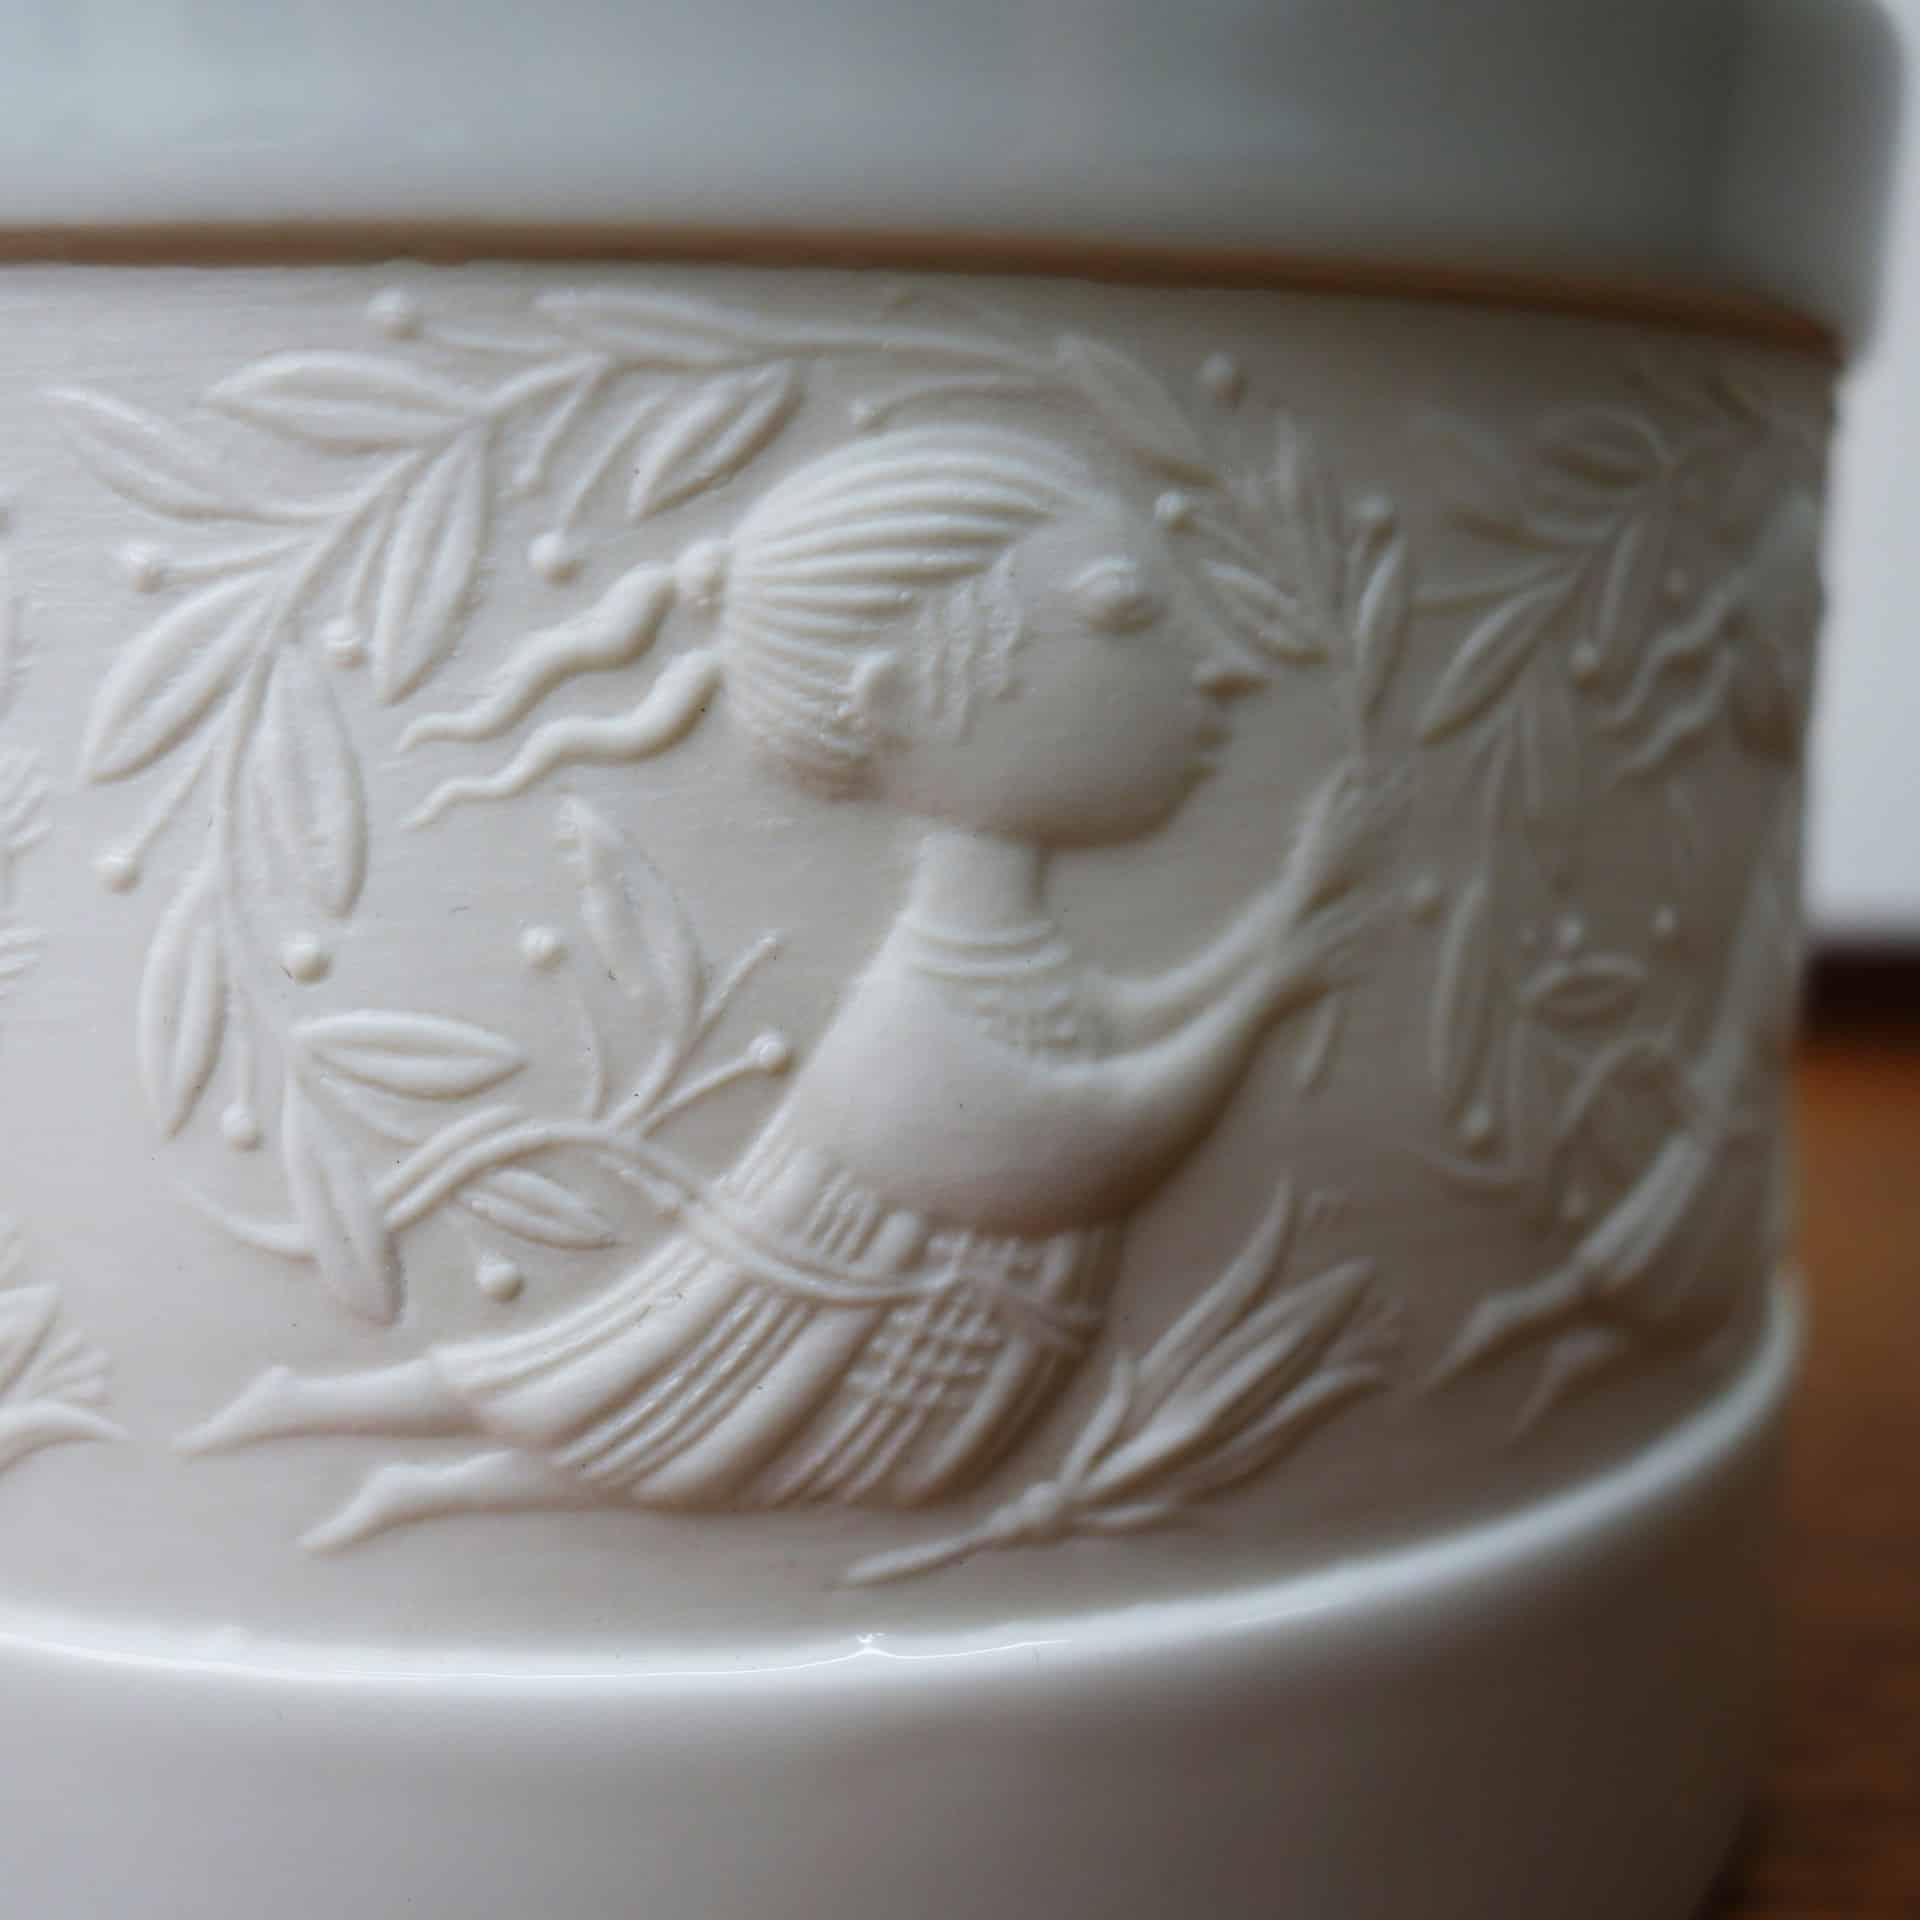 rosenthal studio line pot by bjorn wiinblad